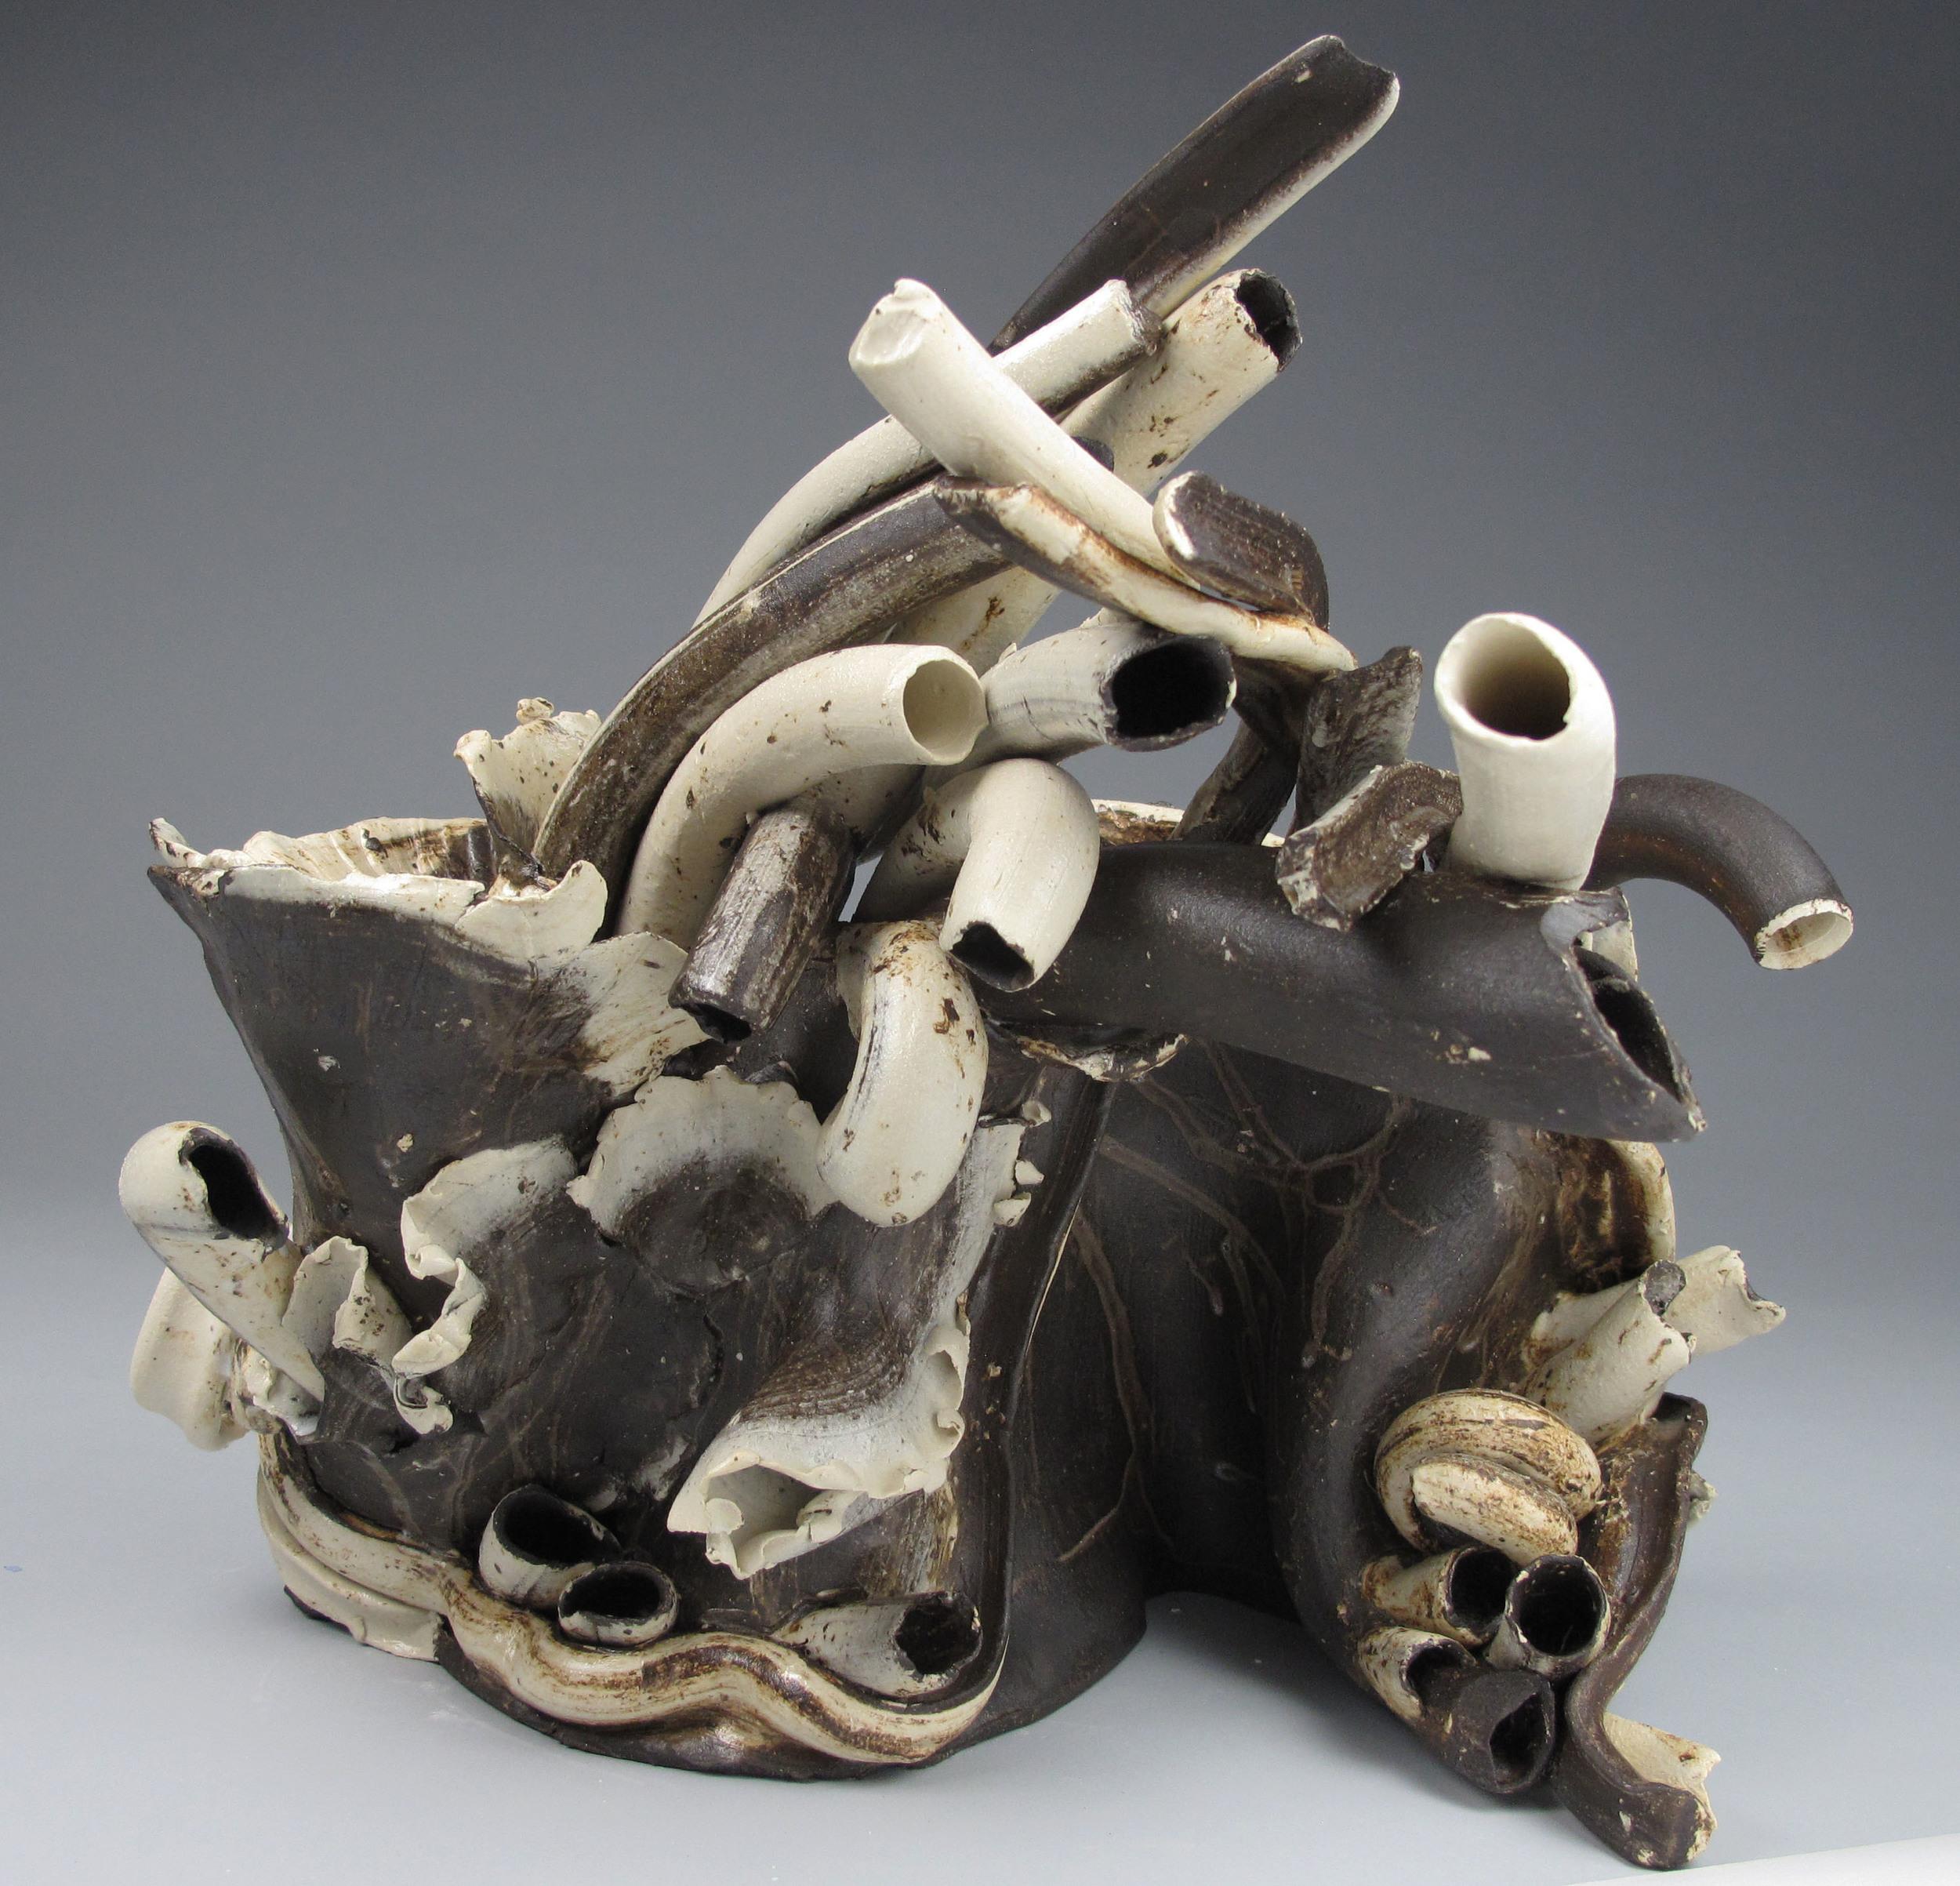 Sara Fine-Wilson ,  Forward Fold , mixed ceramic, 12x10x8